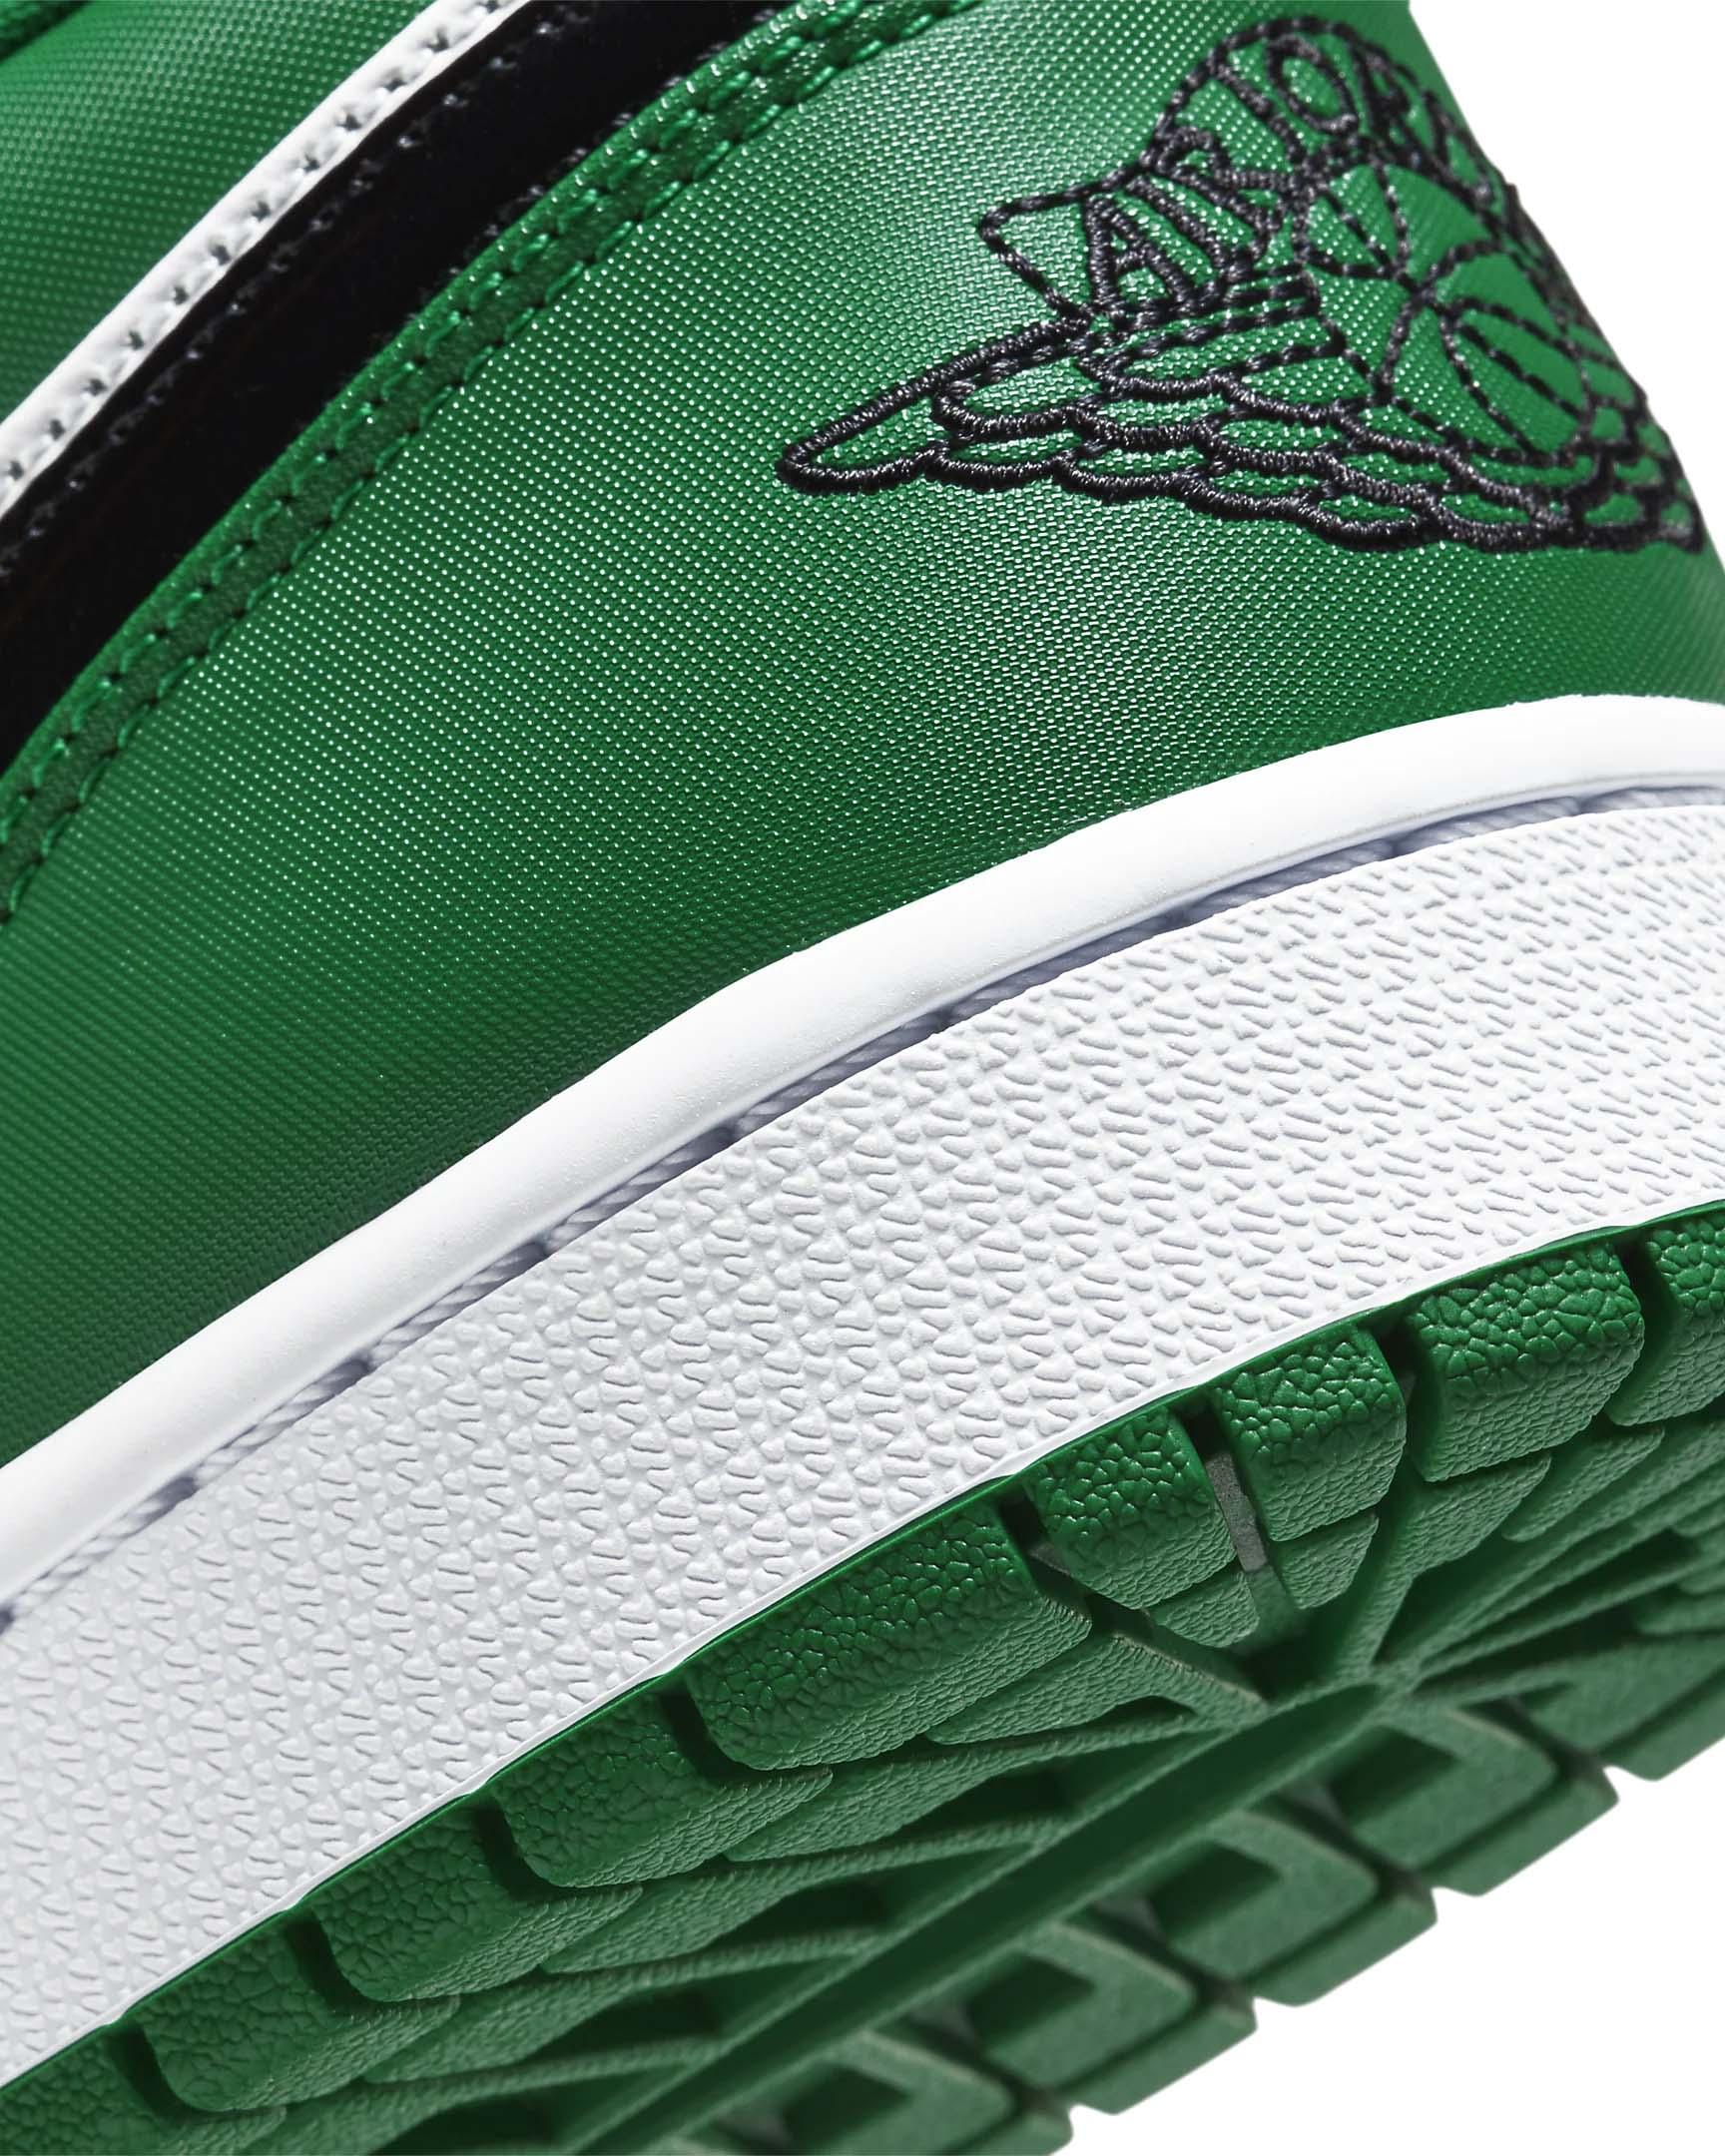 NIKE AIR JORDAN 1 LOW PINE GREEN / BLACK / WHITE 553558-301 ナイキ エアジョーダン1 ロー グリーン/ブラック/ホワイト